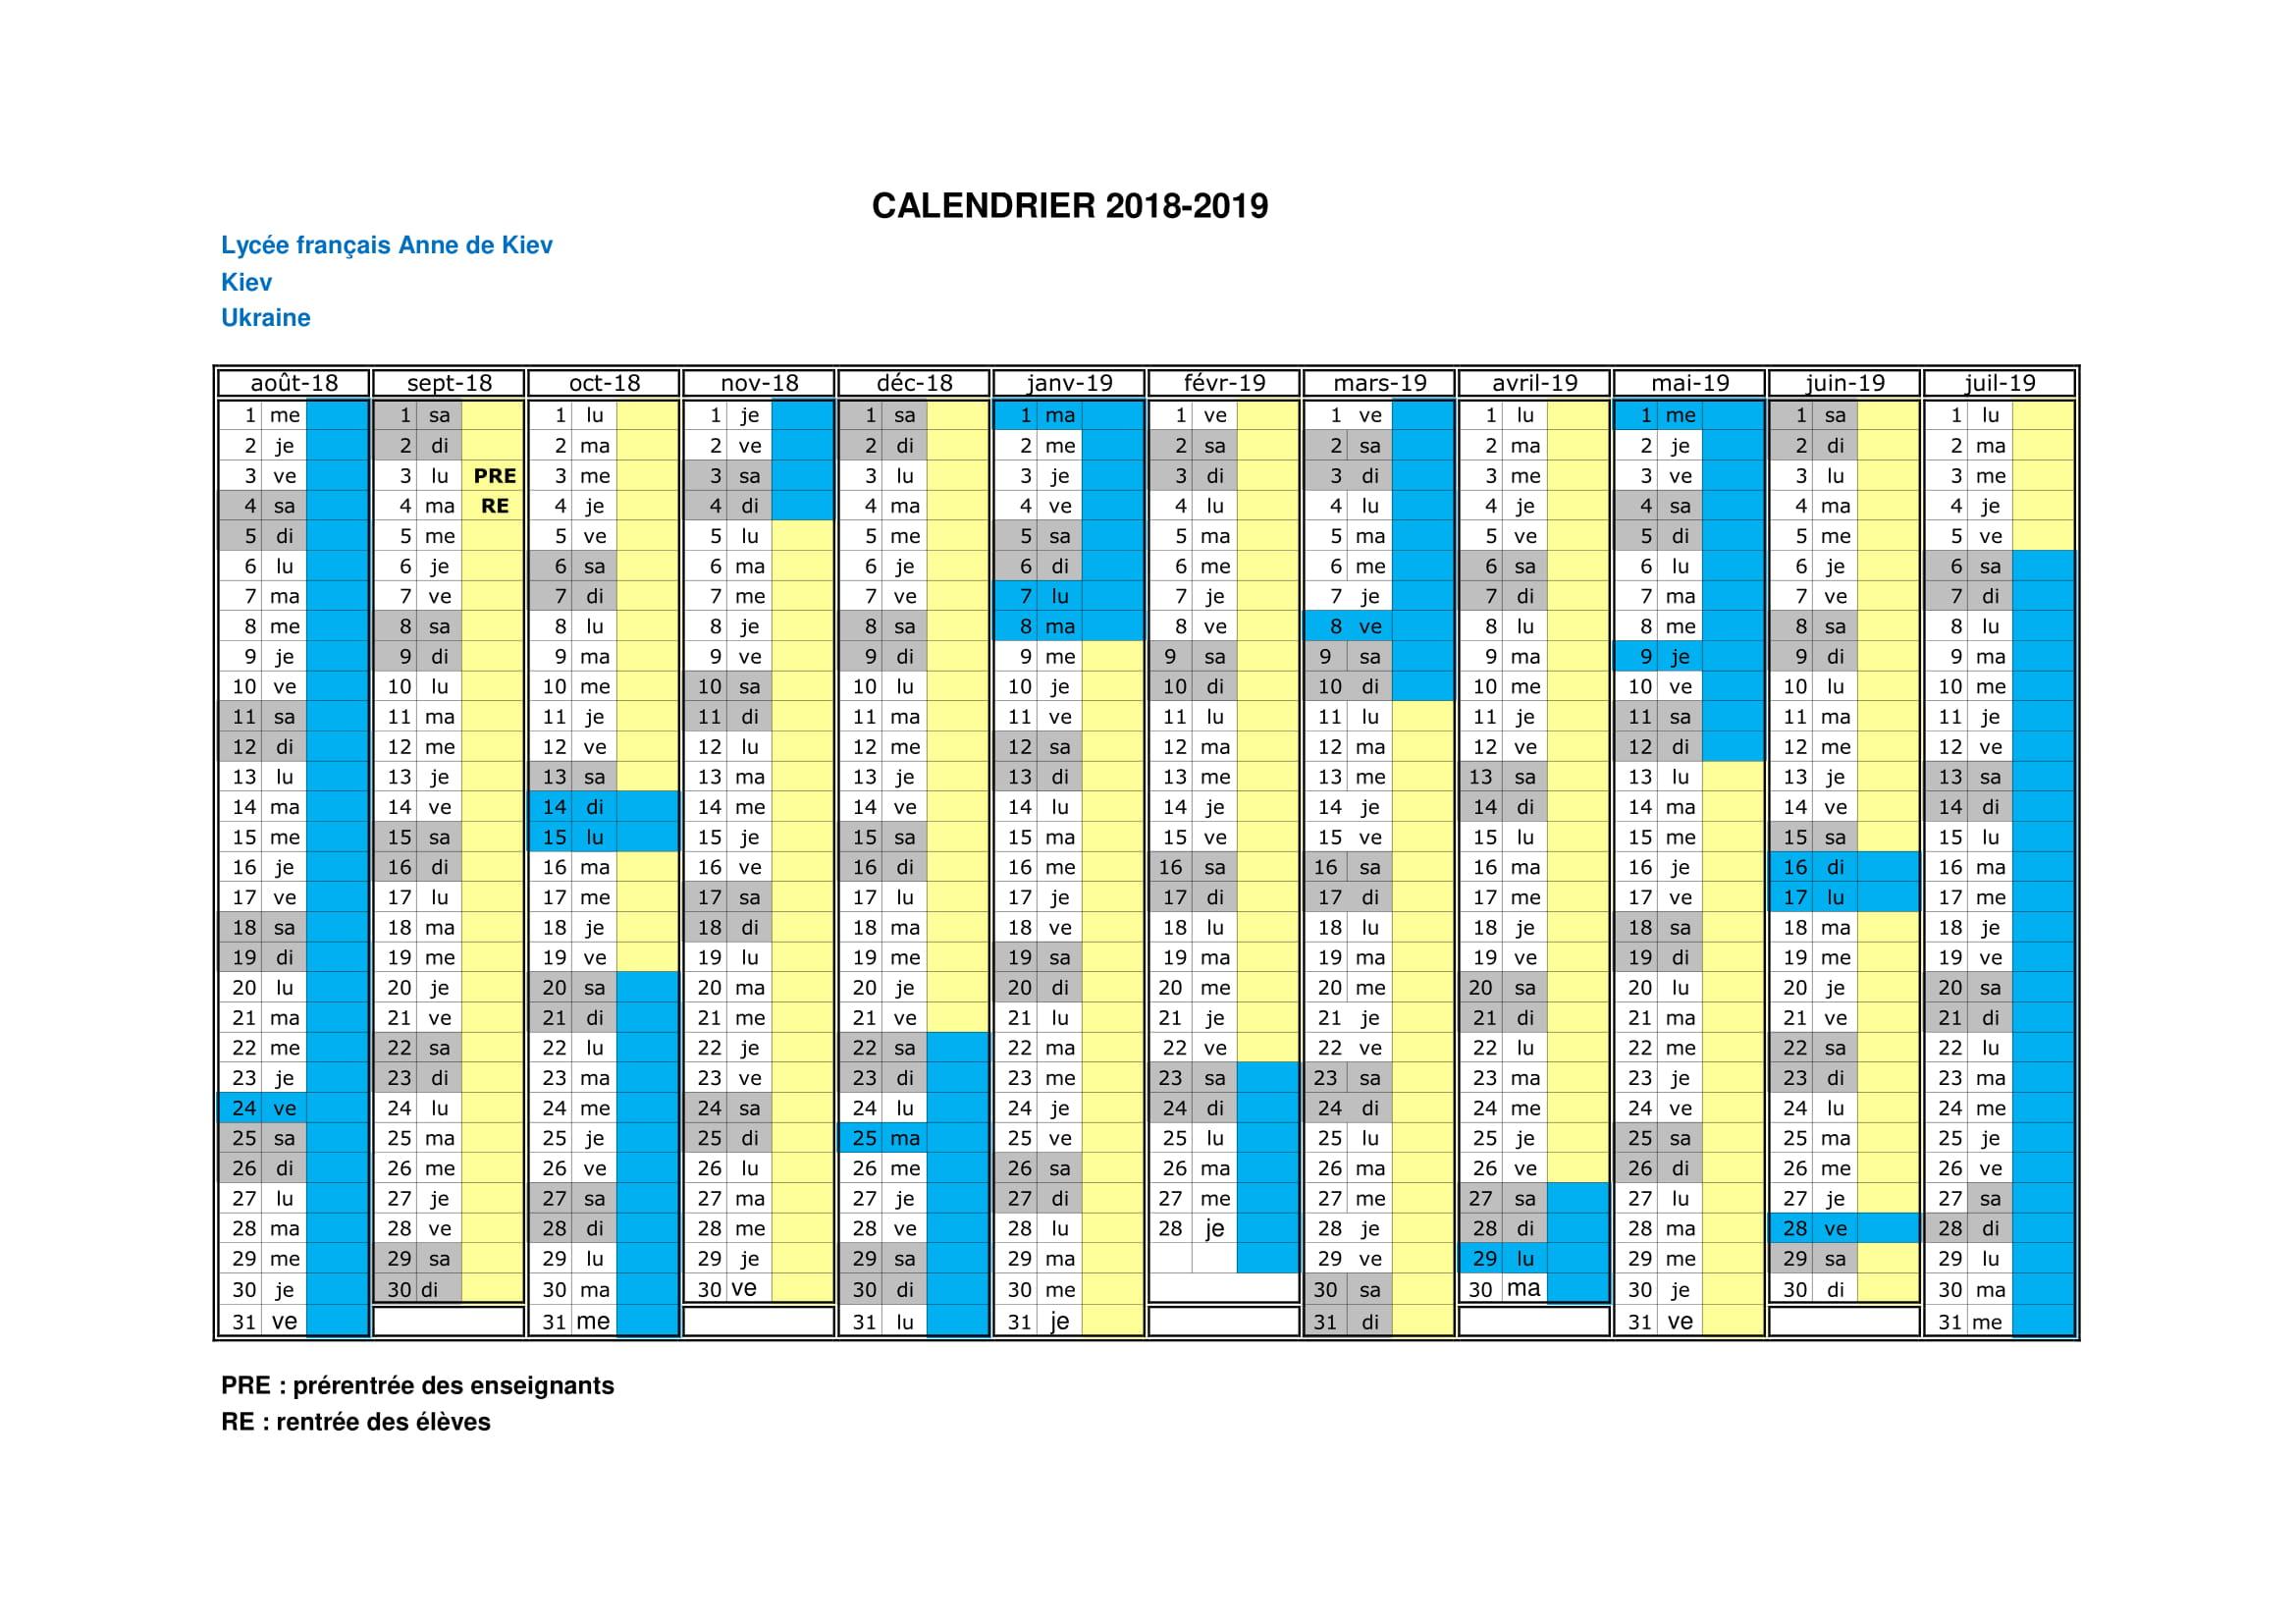 Calendrier 2018-2019 LFADK-1